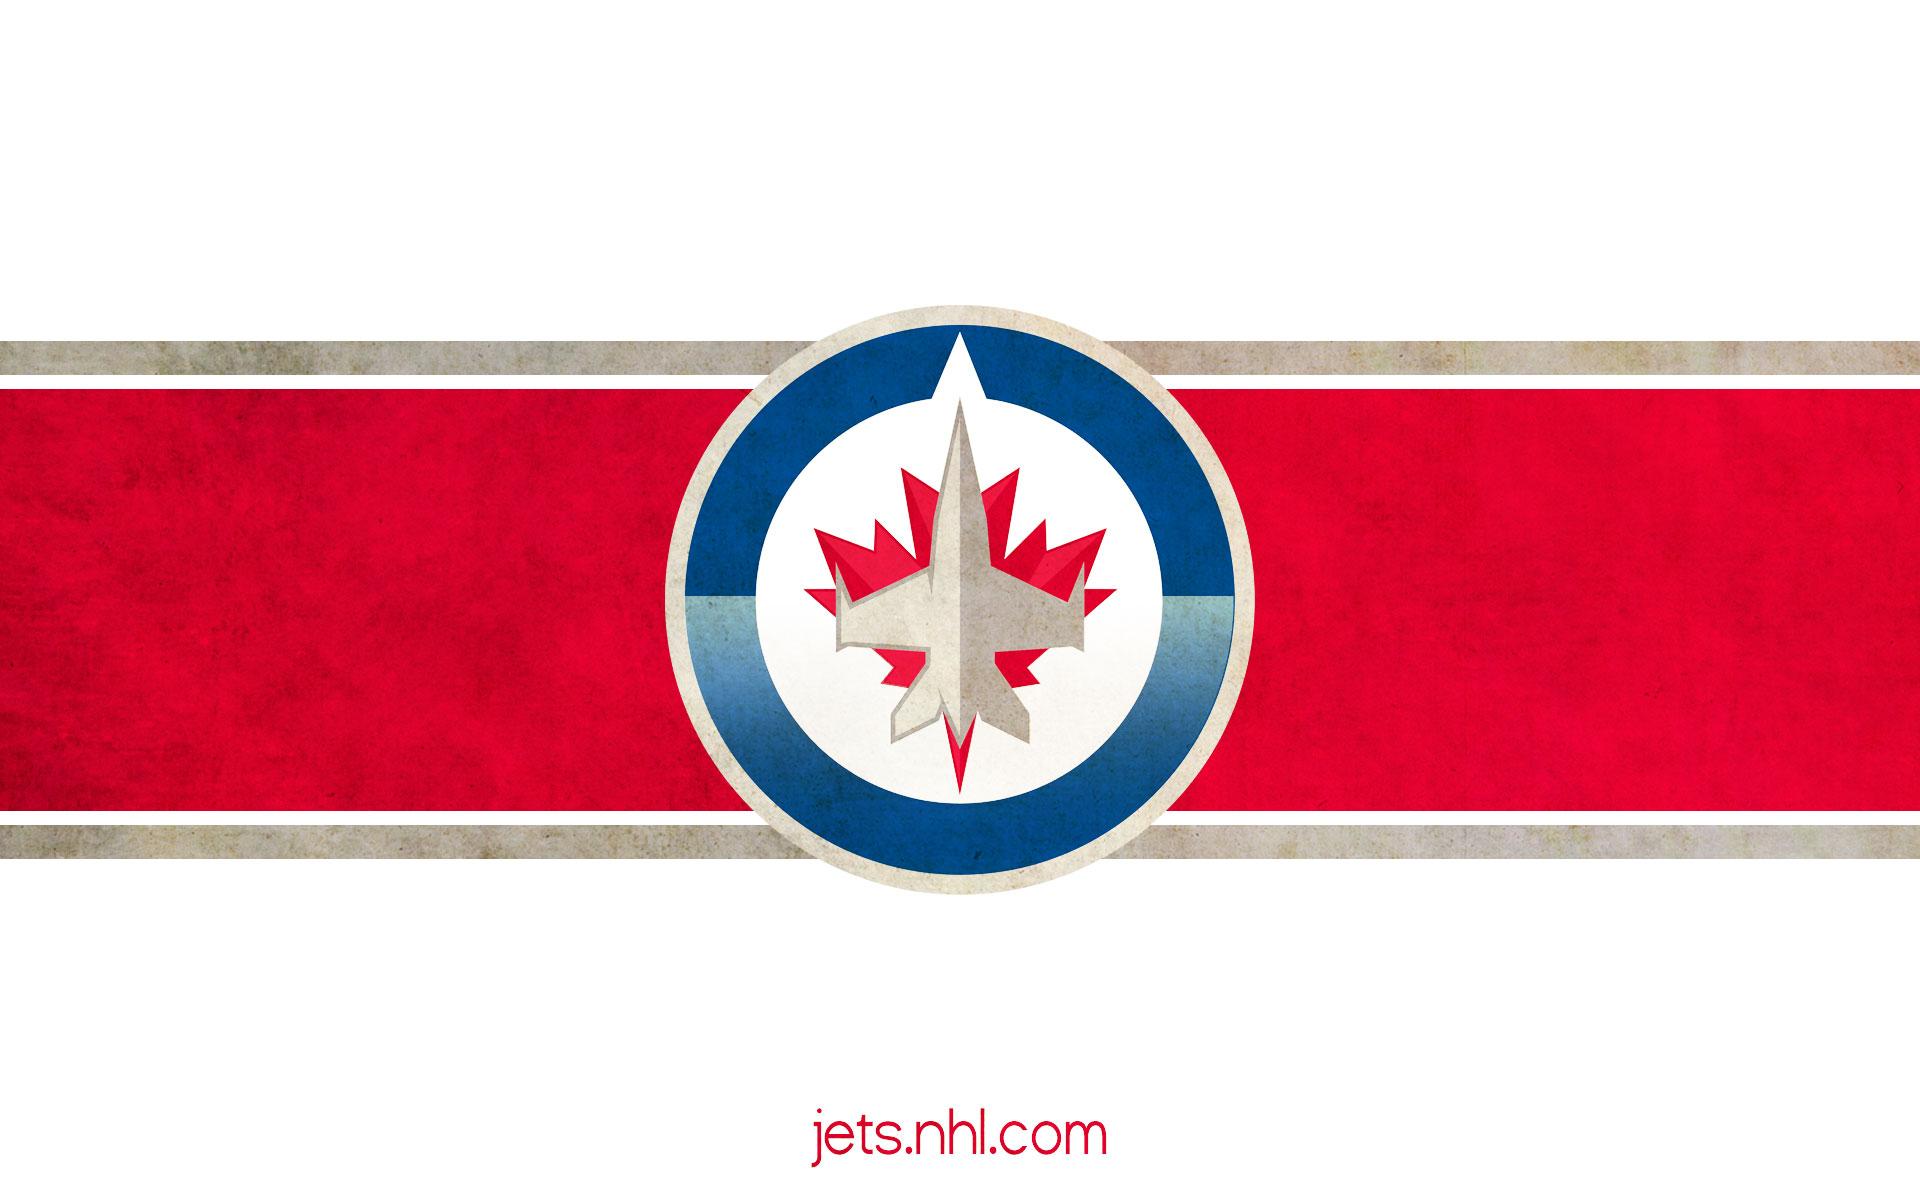 Wallpaper Description 1920x1200 wallpaper of Winnipeg Jets logo 1920x1200